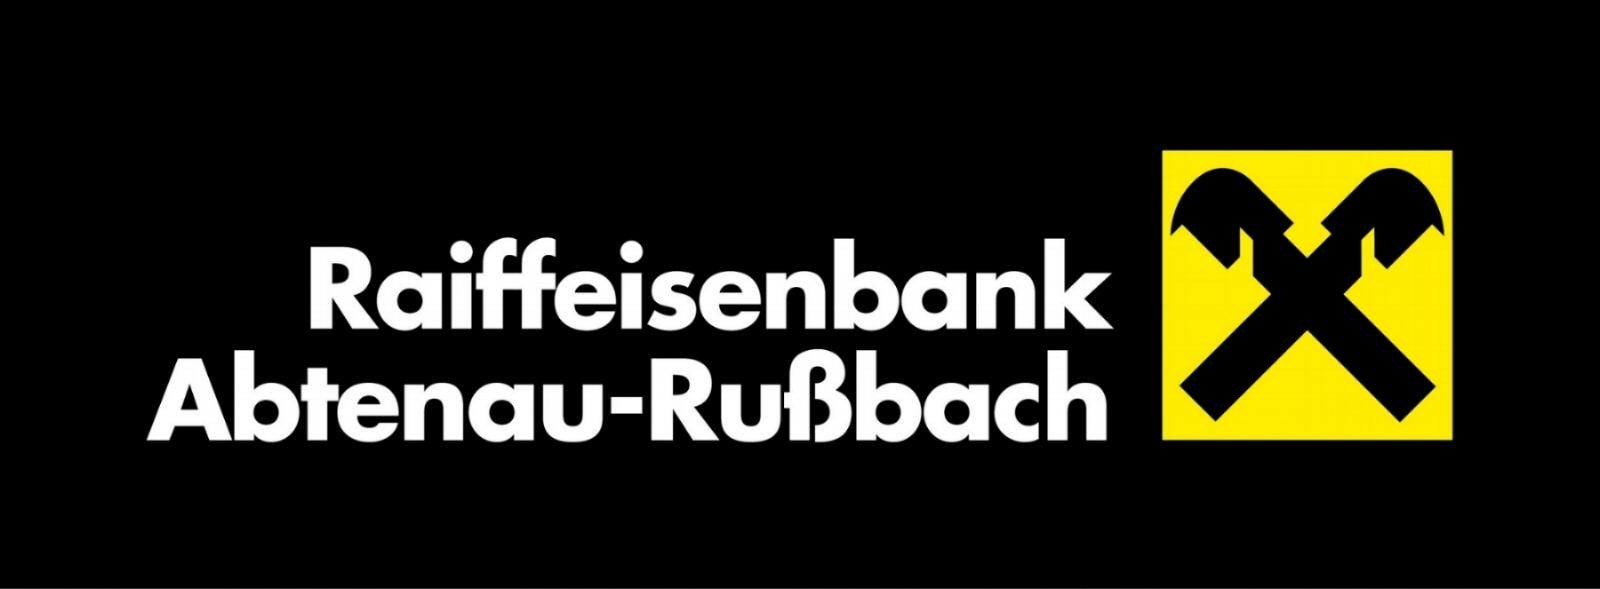 RB Abtenau_Ru+ãÆb_2c_Balken_jpg.jpg